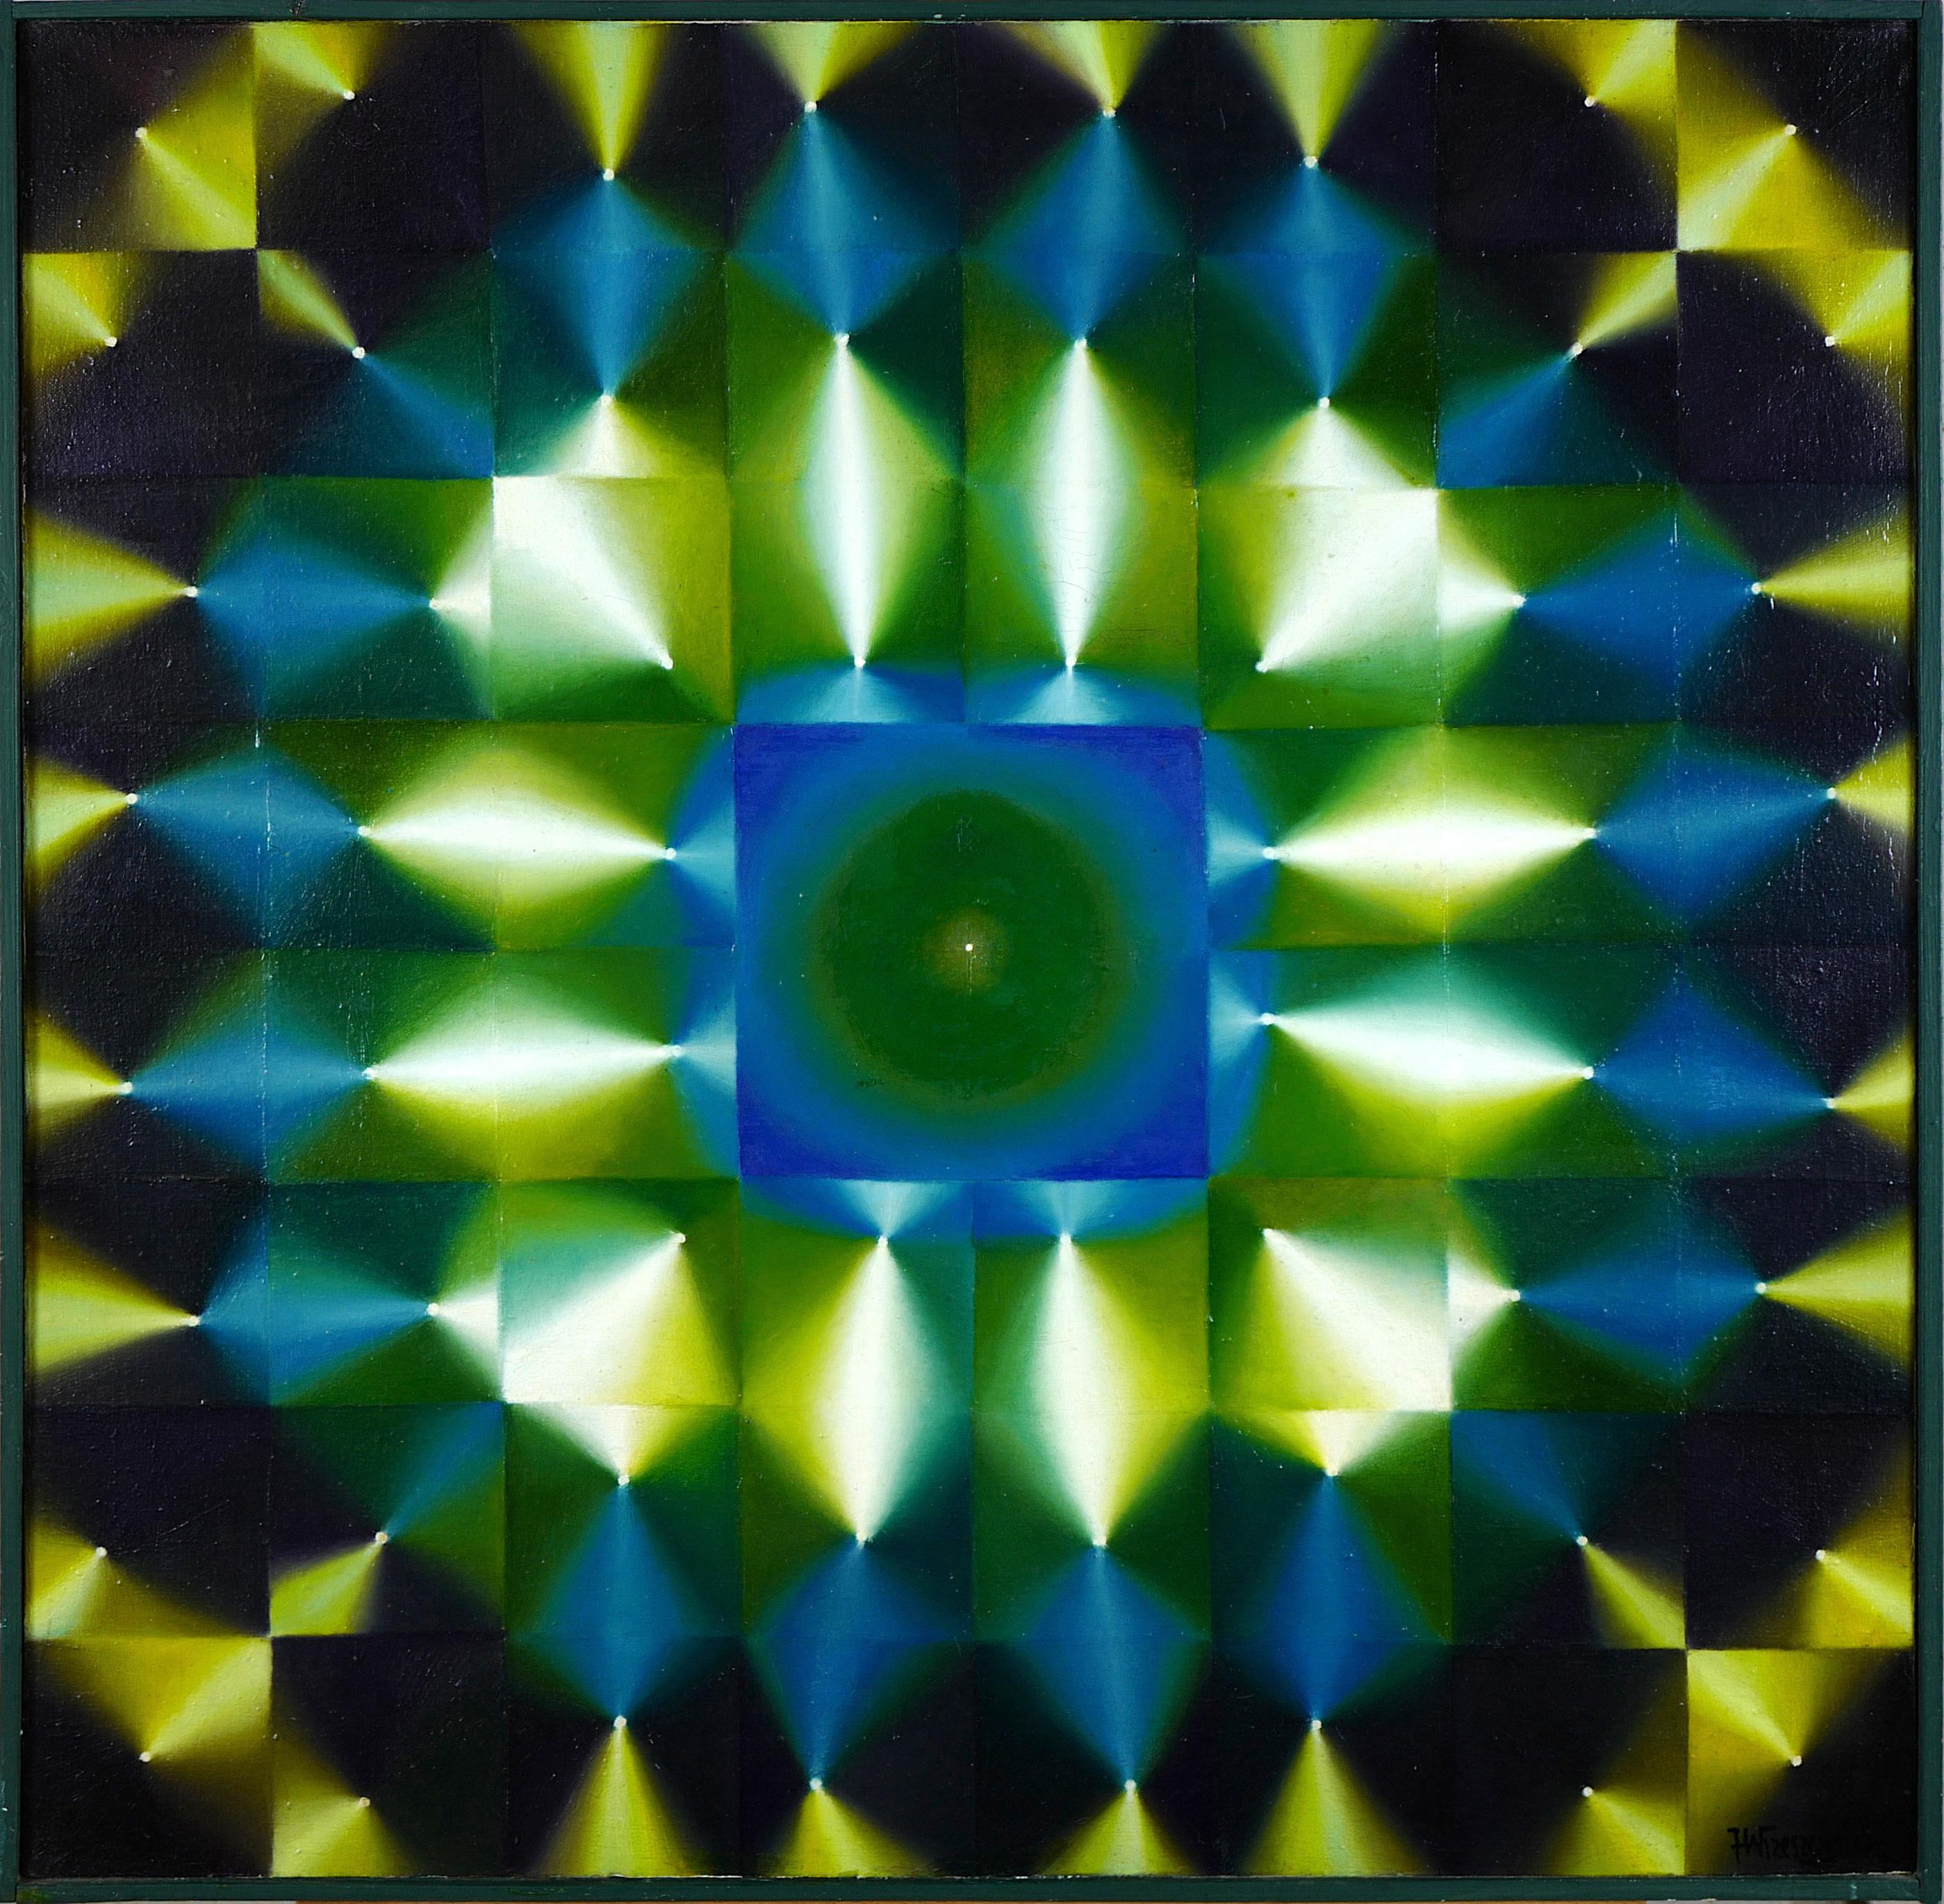 Struktura krystaliczna, 1970 r.